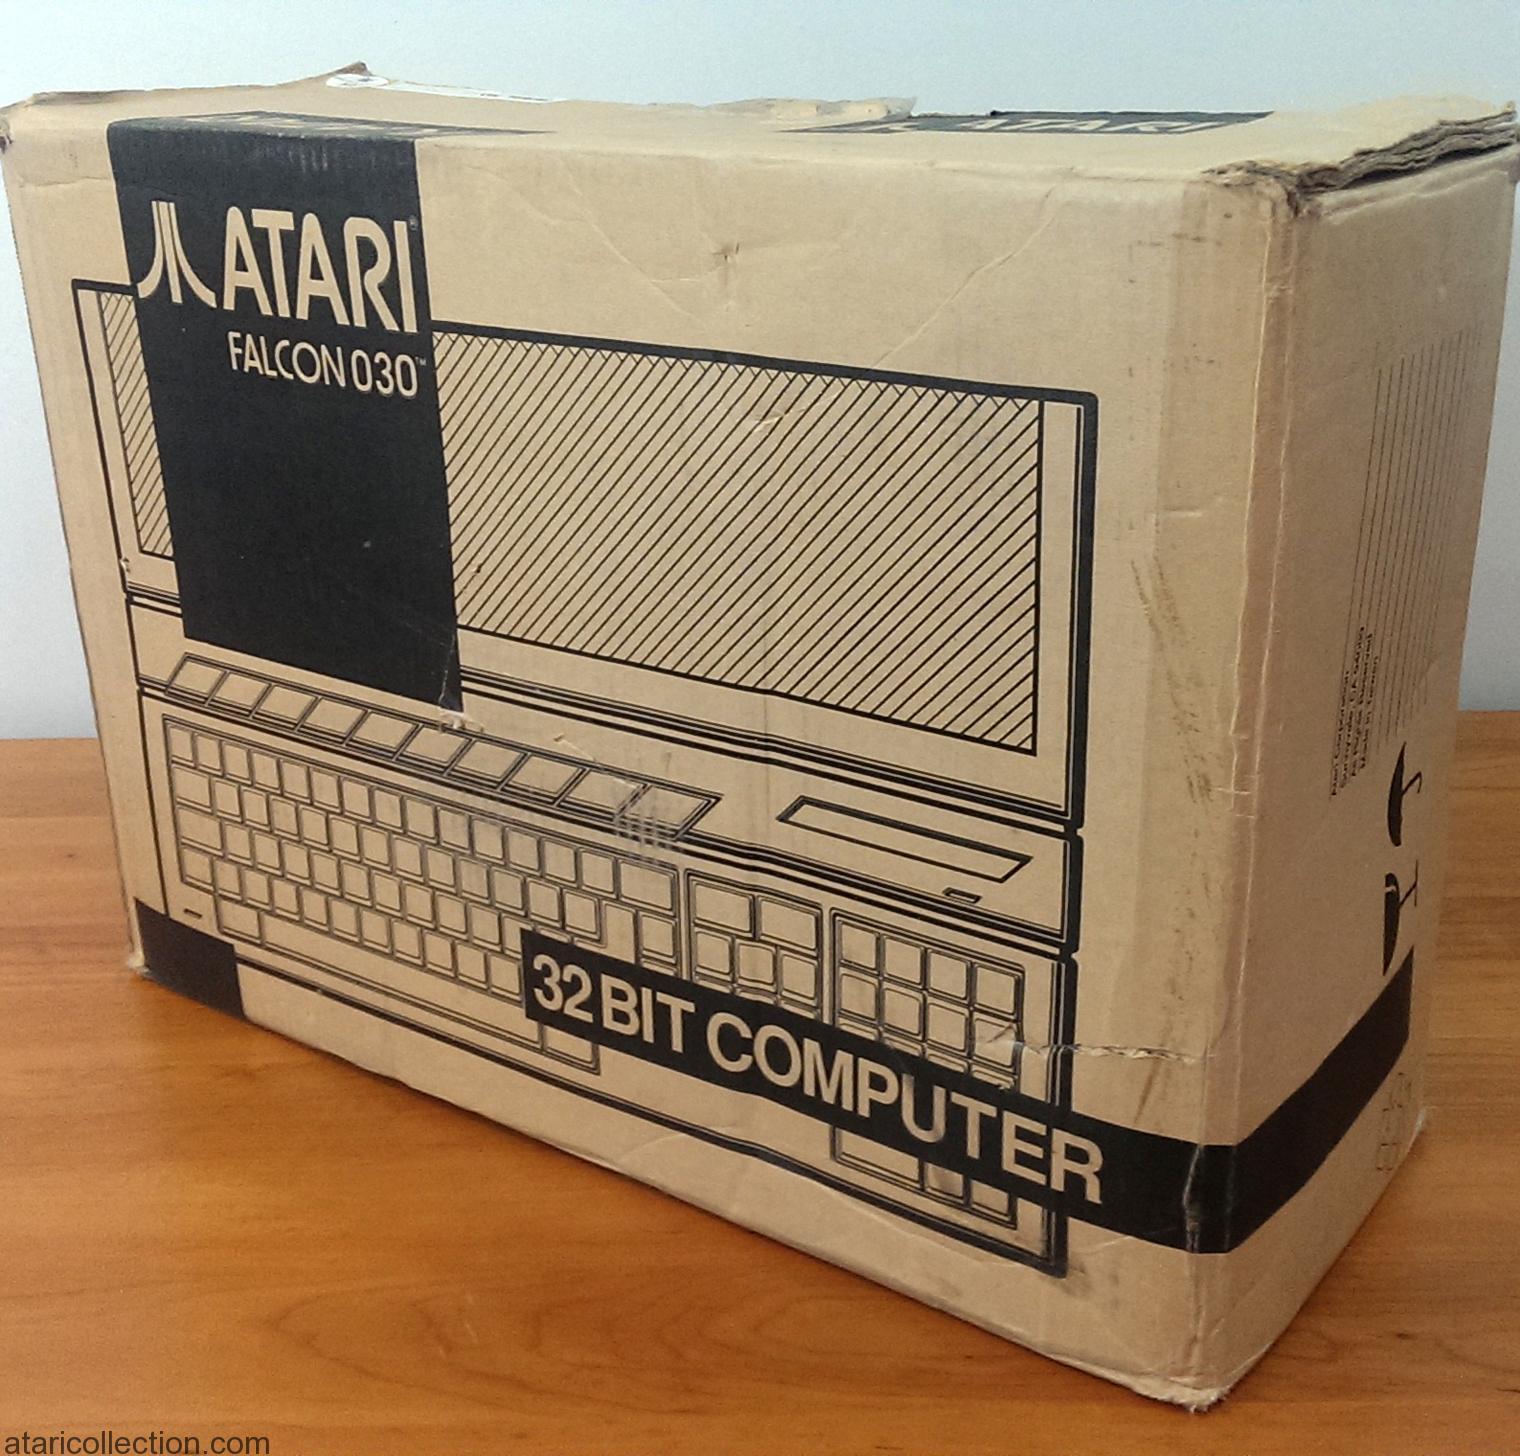 Atari Falcon 030 - 32 Bit Computer Boxed - ATARI COLLECTION